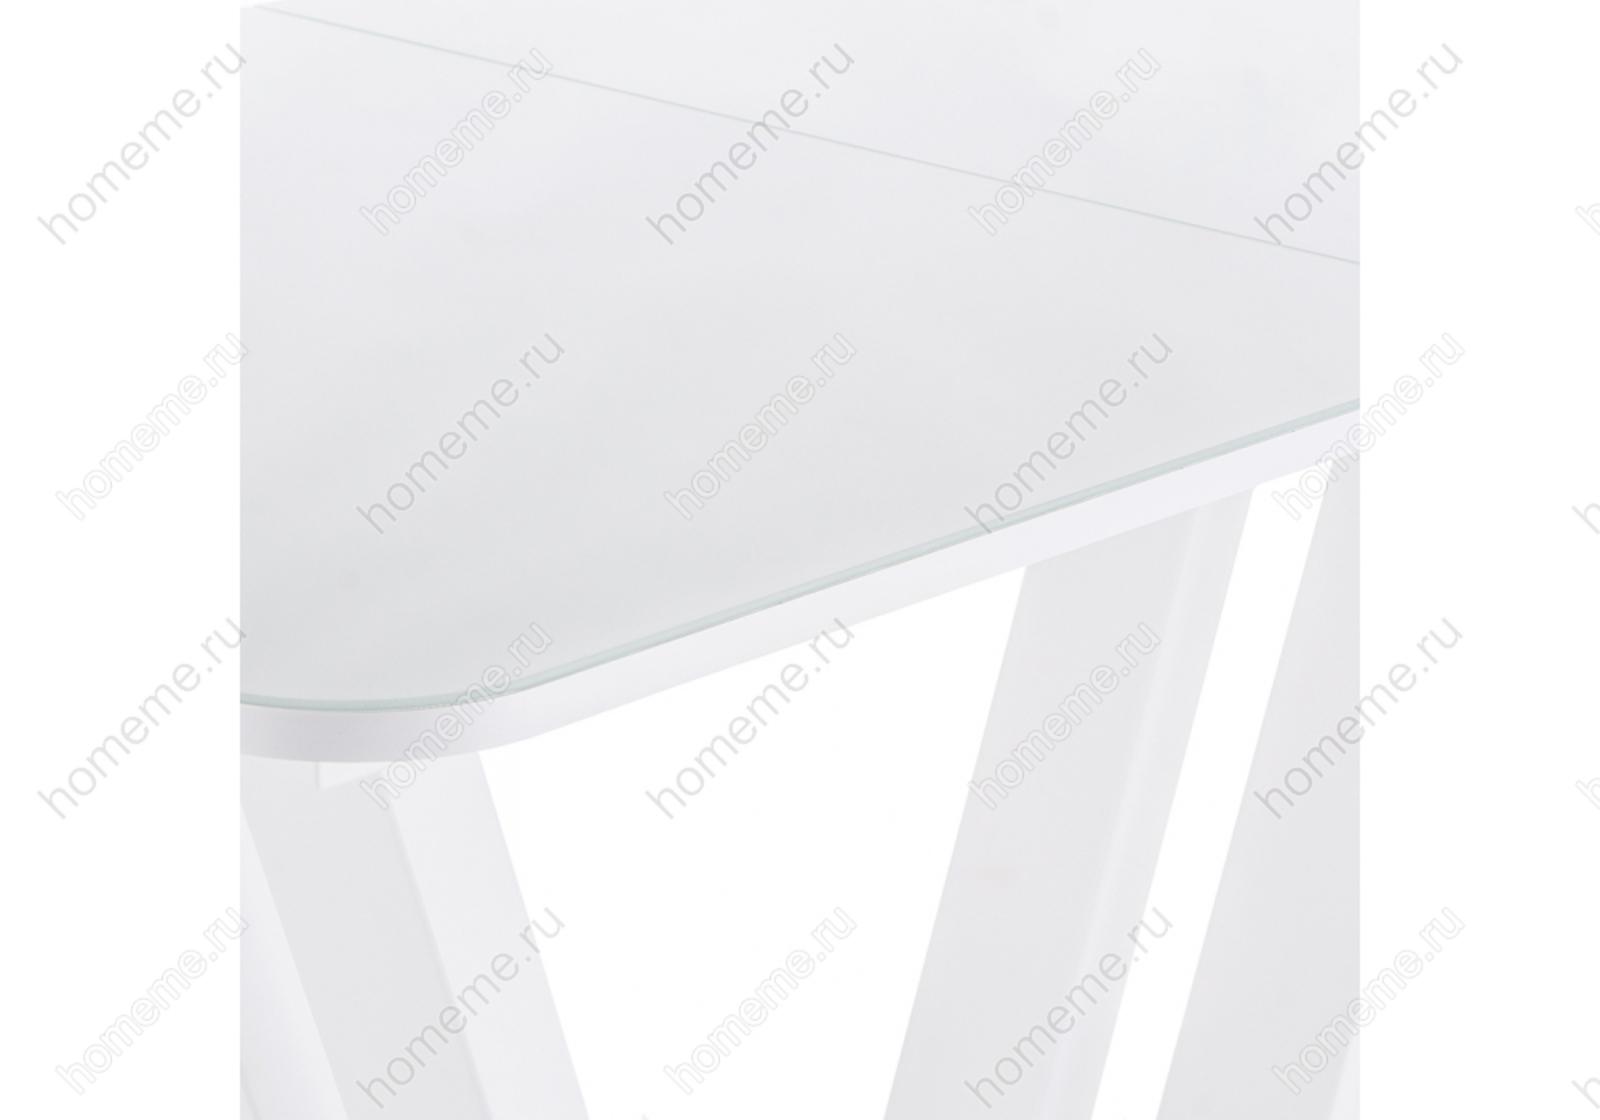 Стол стеклянный Лорент 140 белый 302738 Лорент 140 белый 302738 (15323)